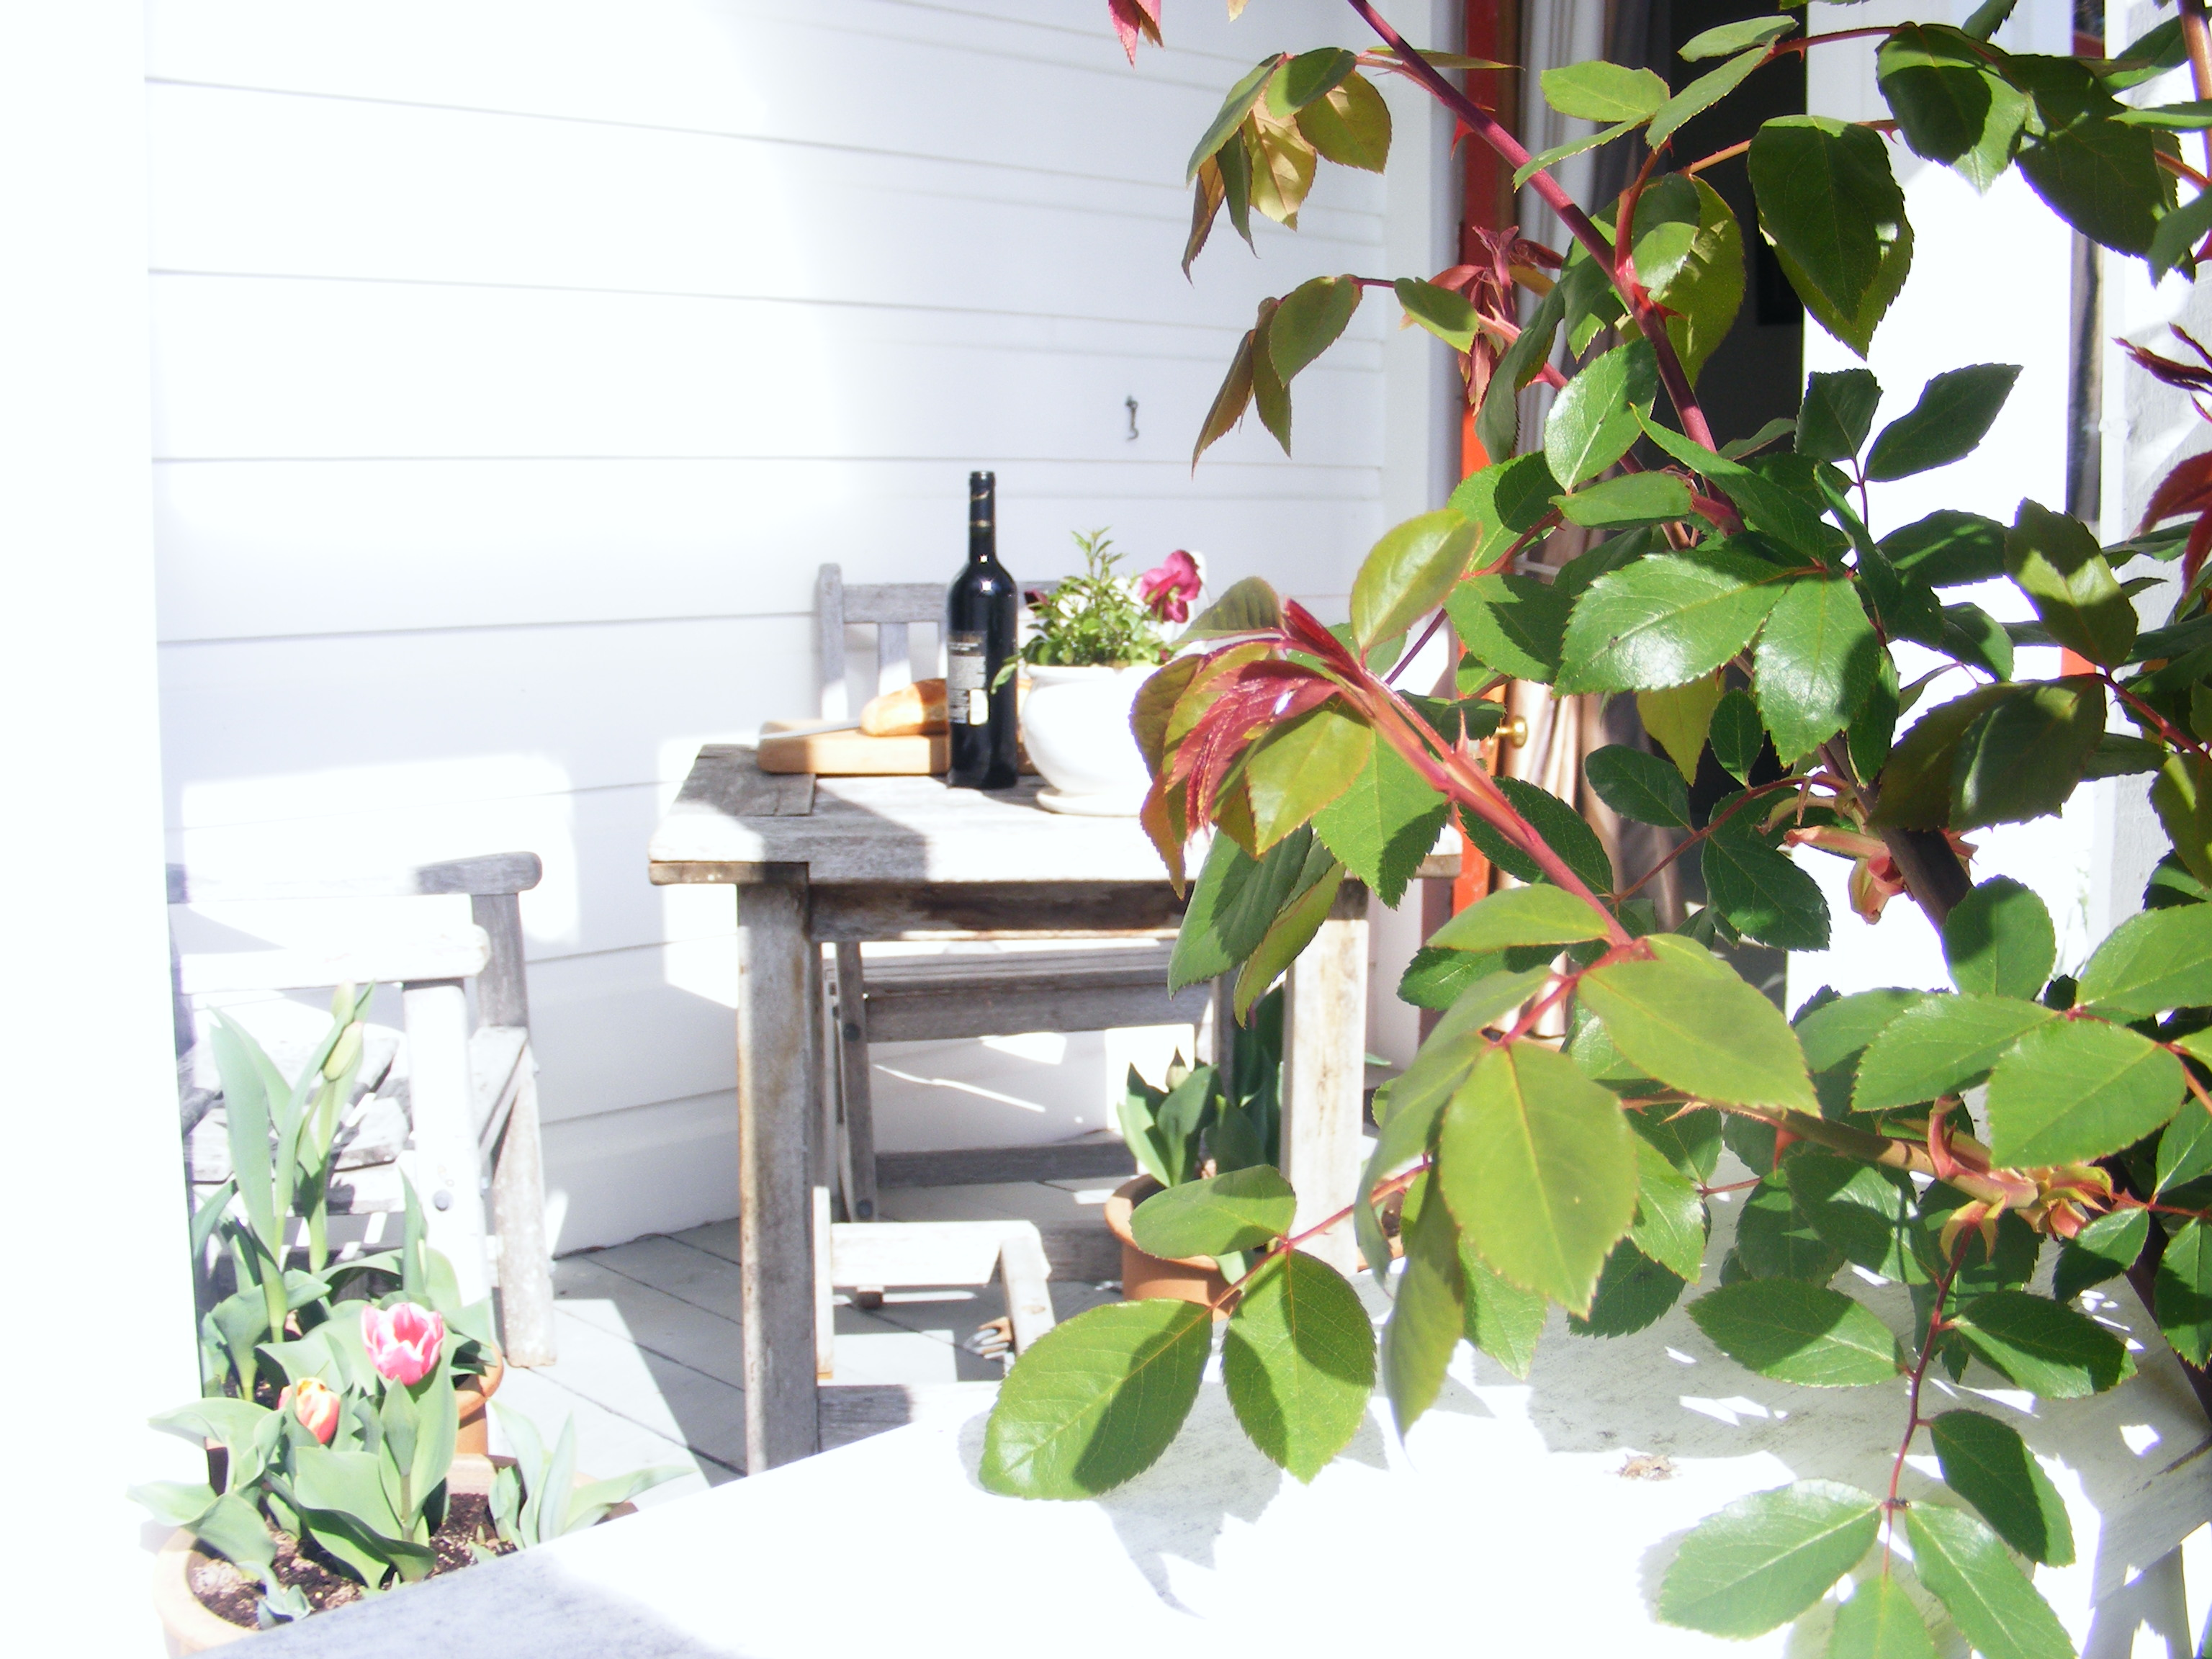 Verandah Table and Chairs